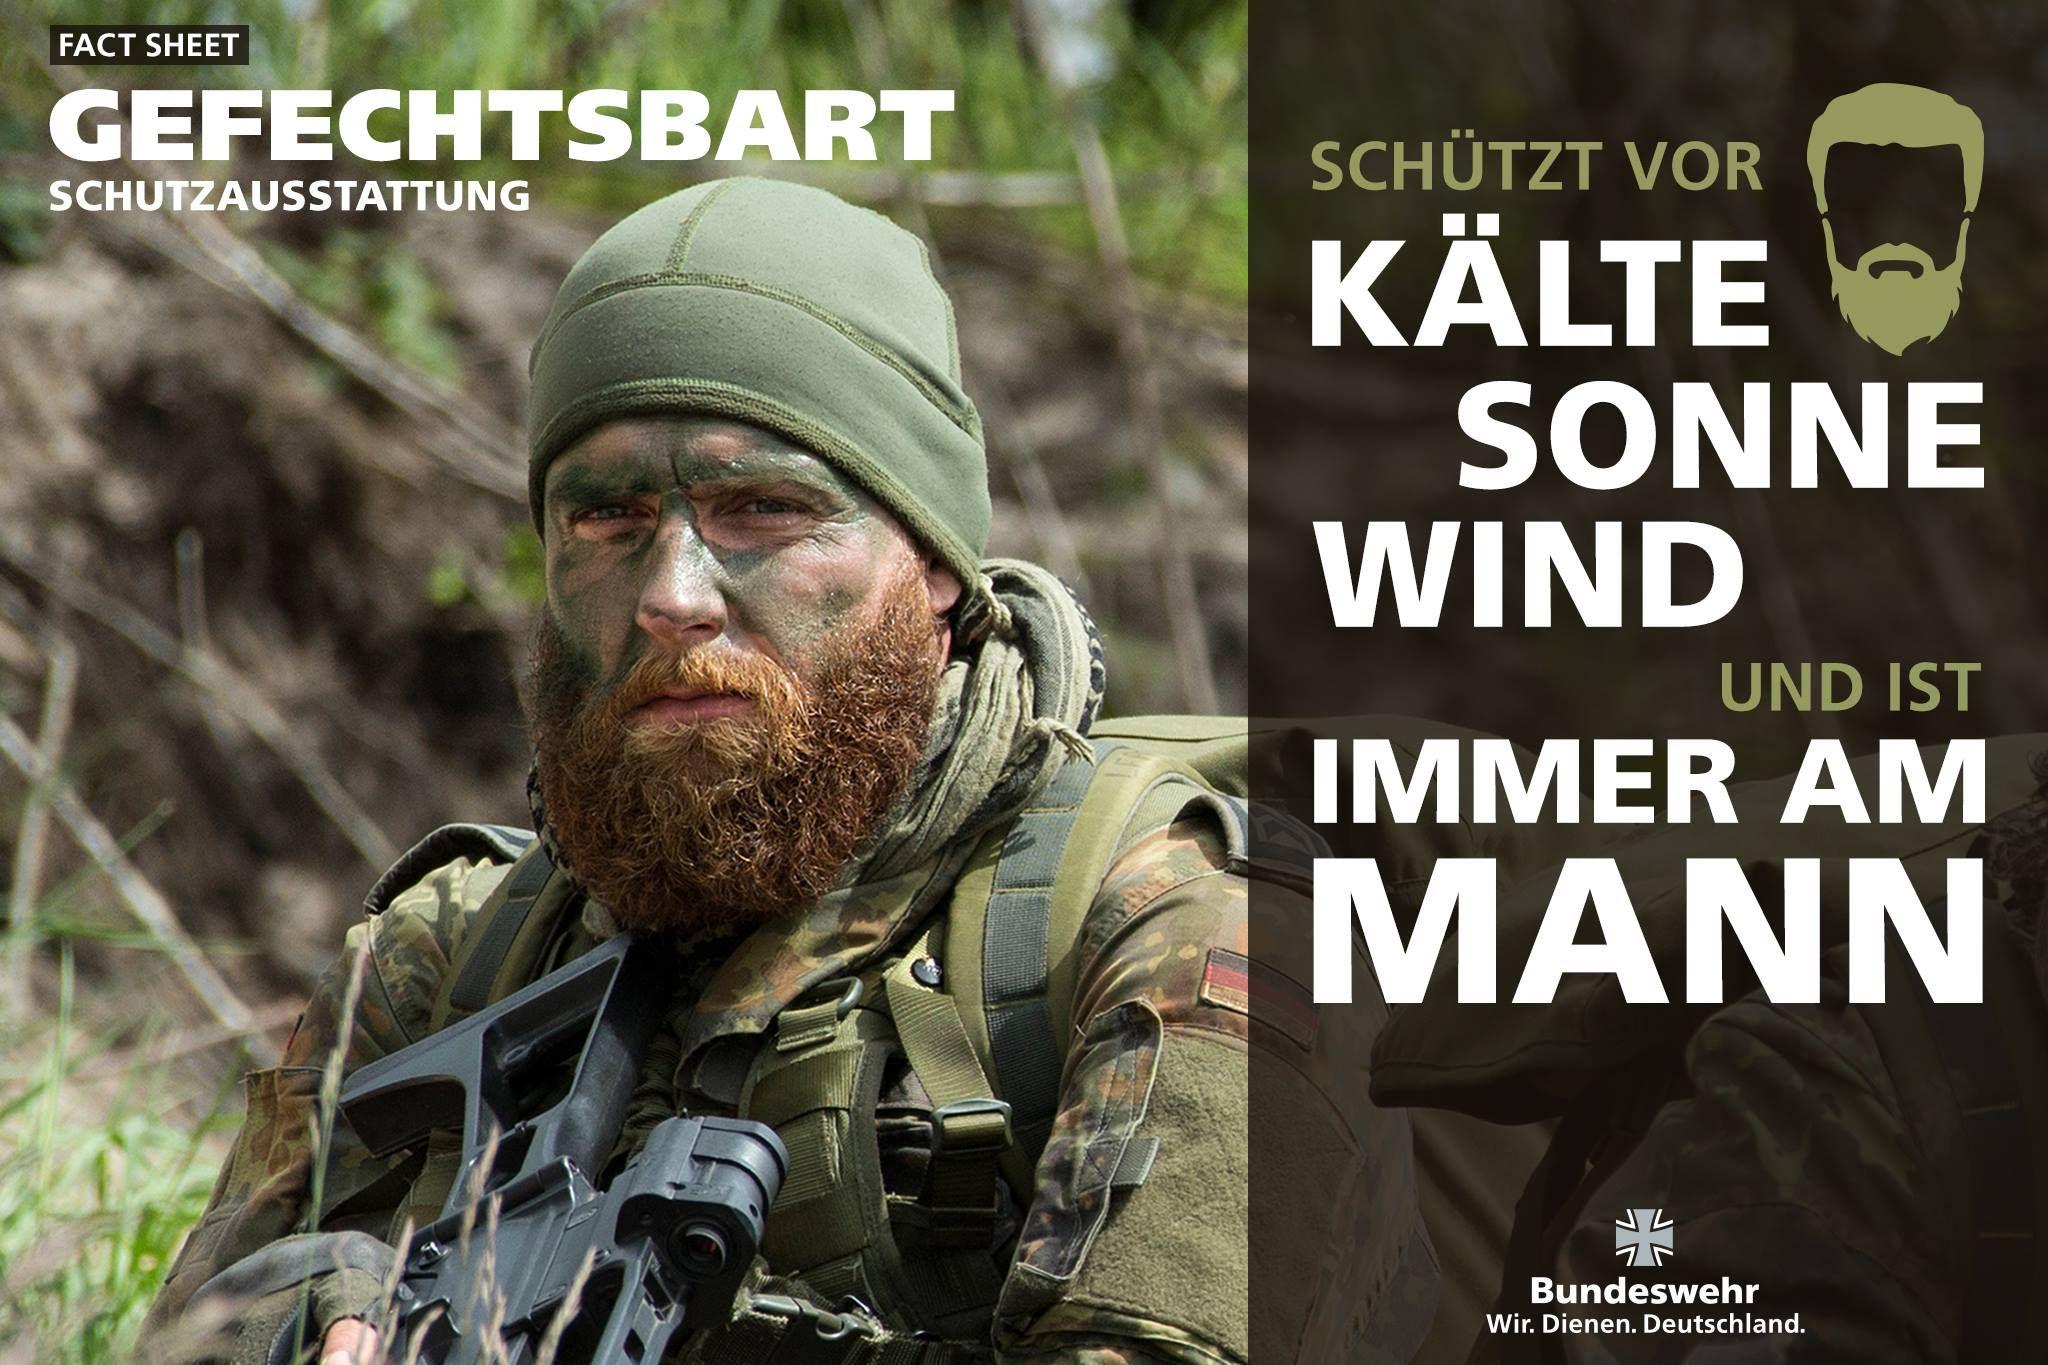 German bundeswehr fact sheet gefechtsbart 2048x1365